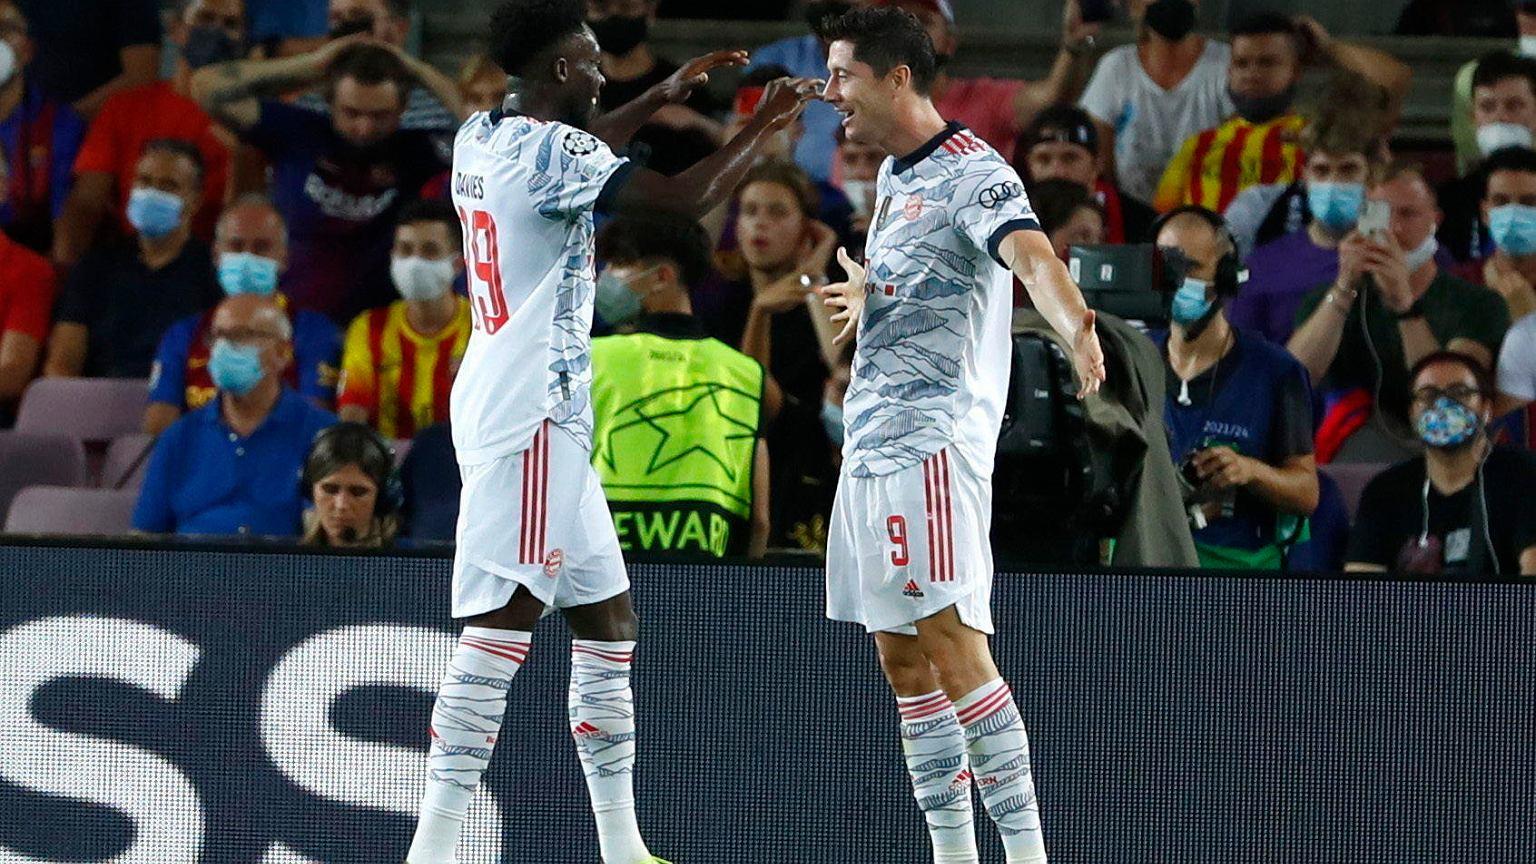 Lewandowski stabilește un alt record!  Unde va urmări meciul Bayern-Bochum? [TRANSMISJA] Becca Nona